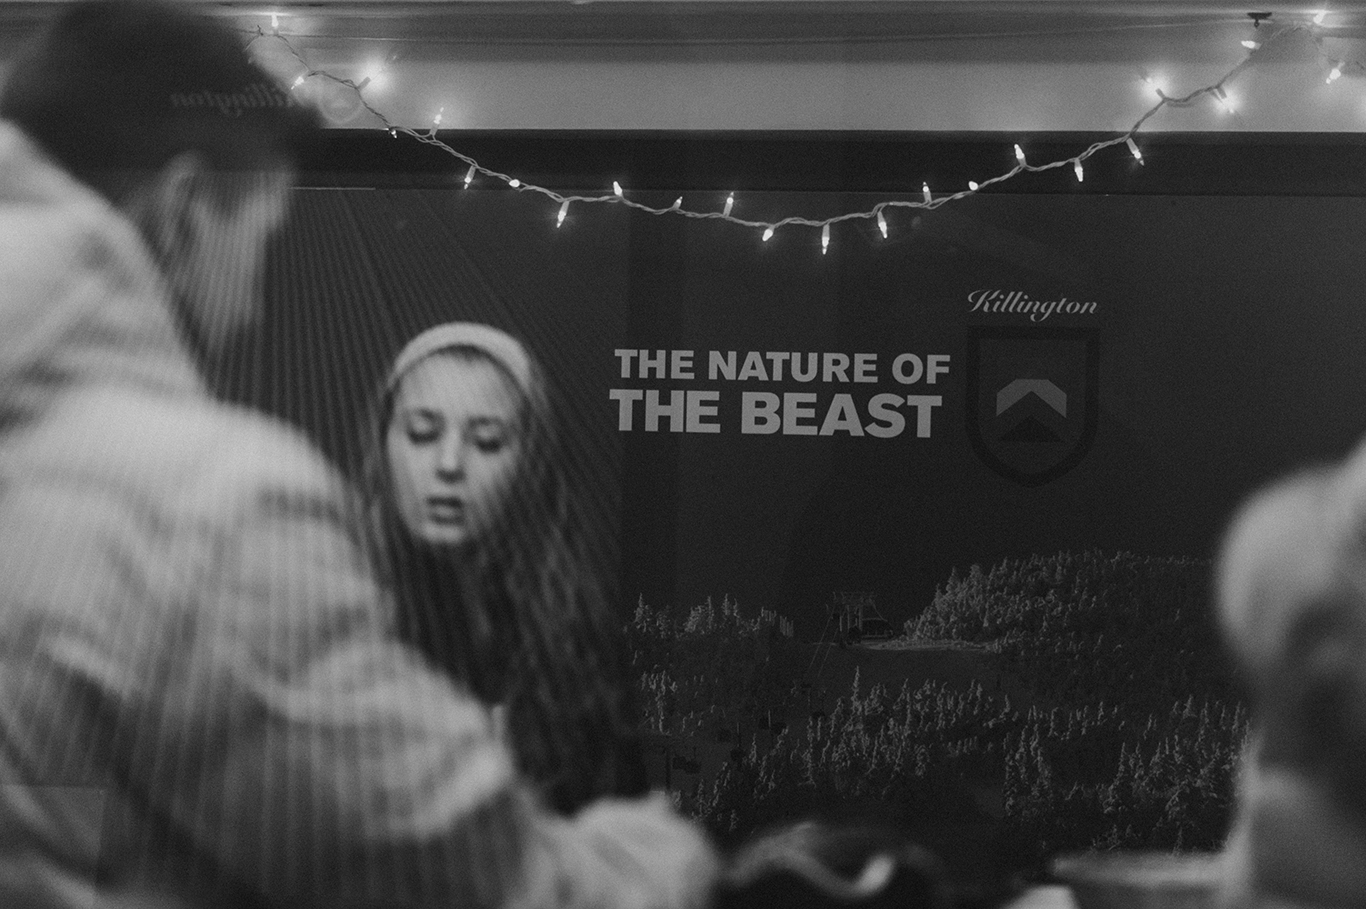 the-nature-of-the-beast-killington-vermont.jpg